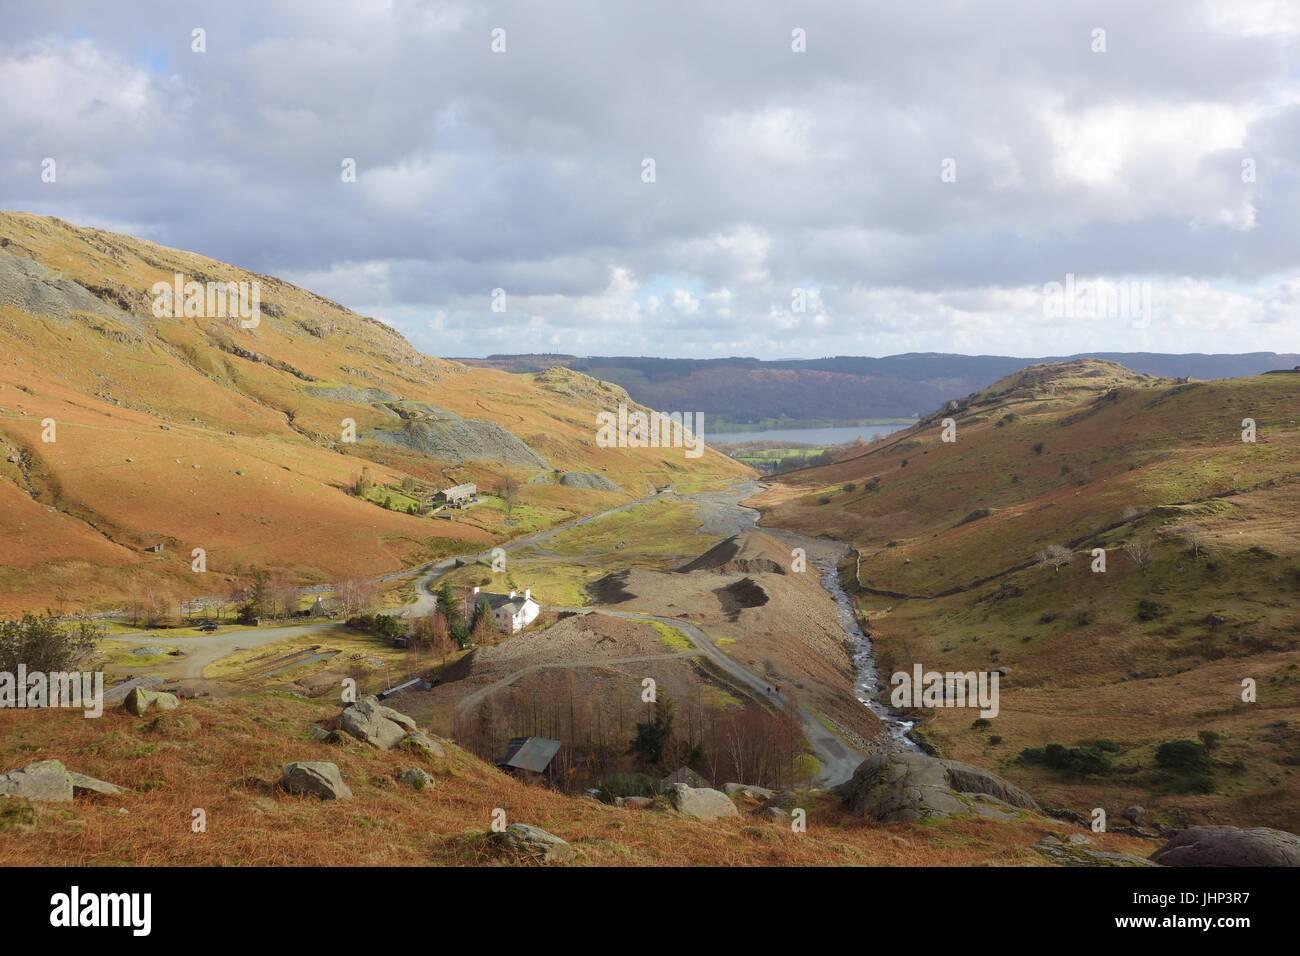 View over Coniston Copper Mines, Cumbria, England. - Stock Image